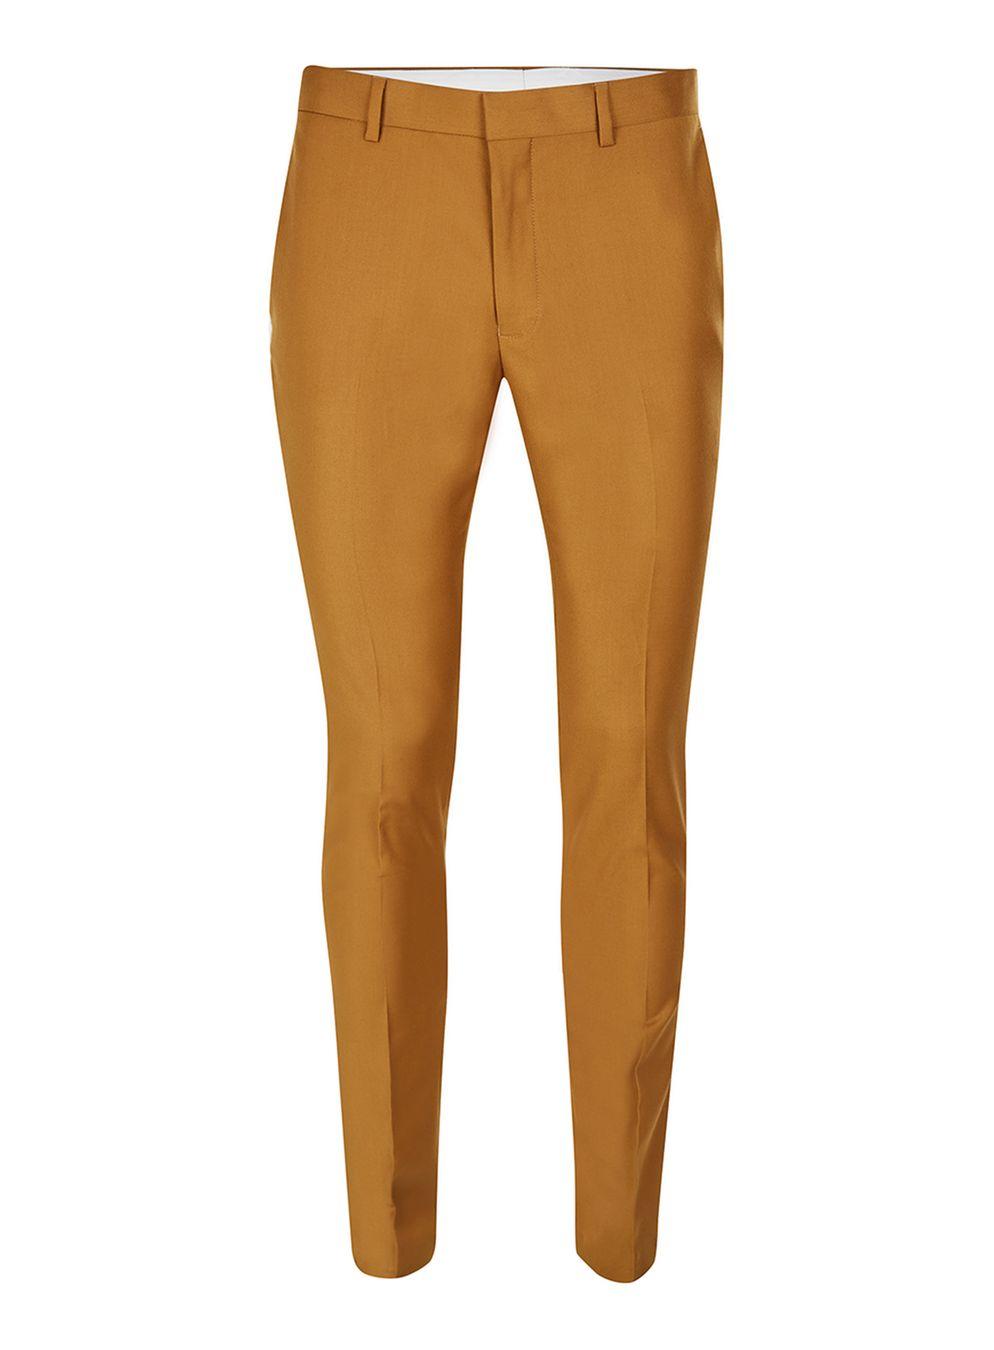 topman-suit-torn-paper-print-ss-woven-topman-trousers.jpg